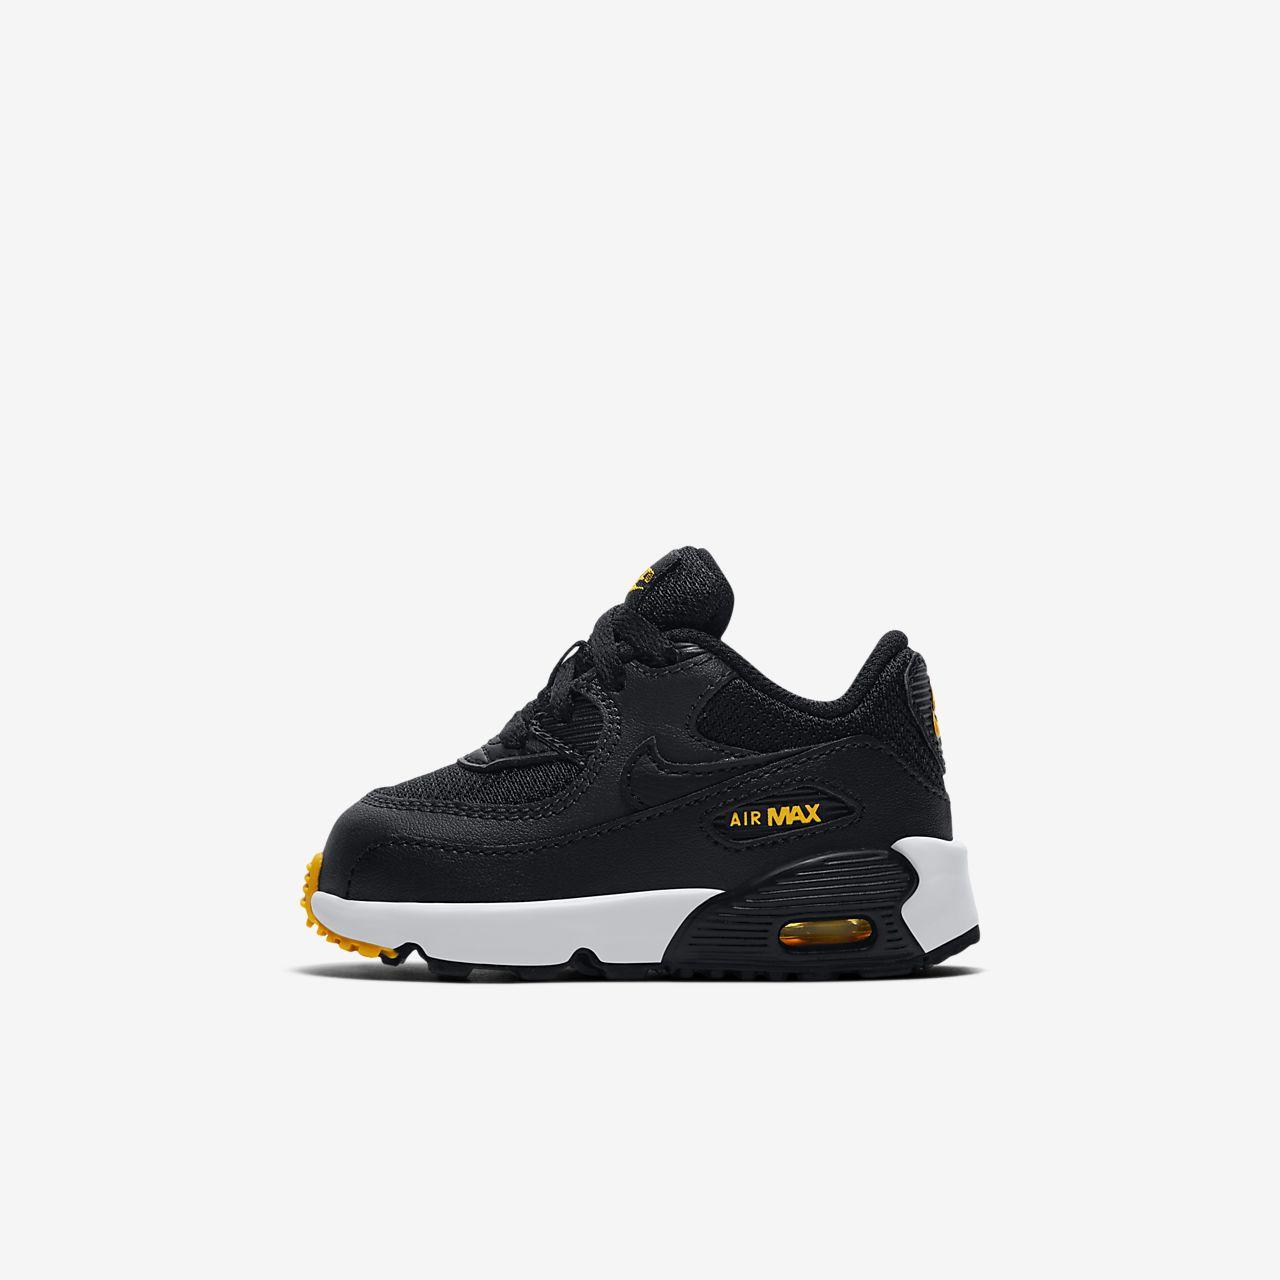 0d44cdbbb0031 Chaussure Nike Air Max 90 Mesh pour Bébé Petit enfant (17-27). Nike ...